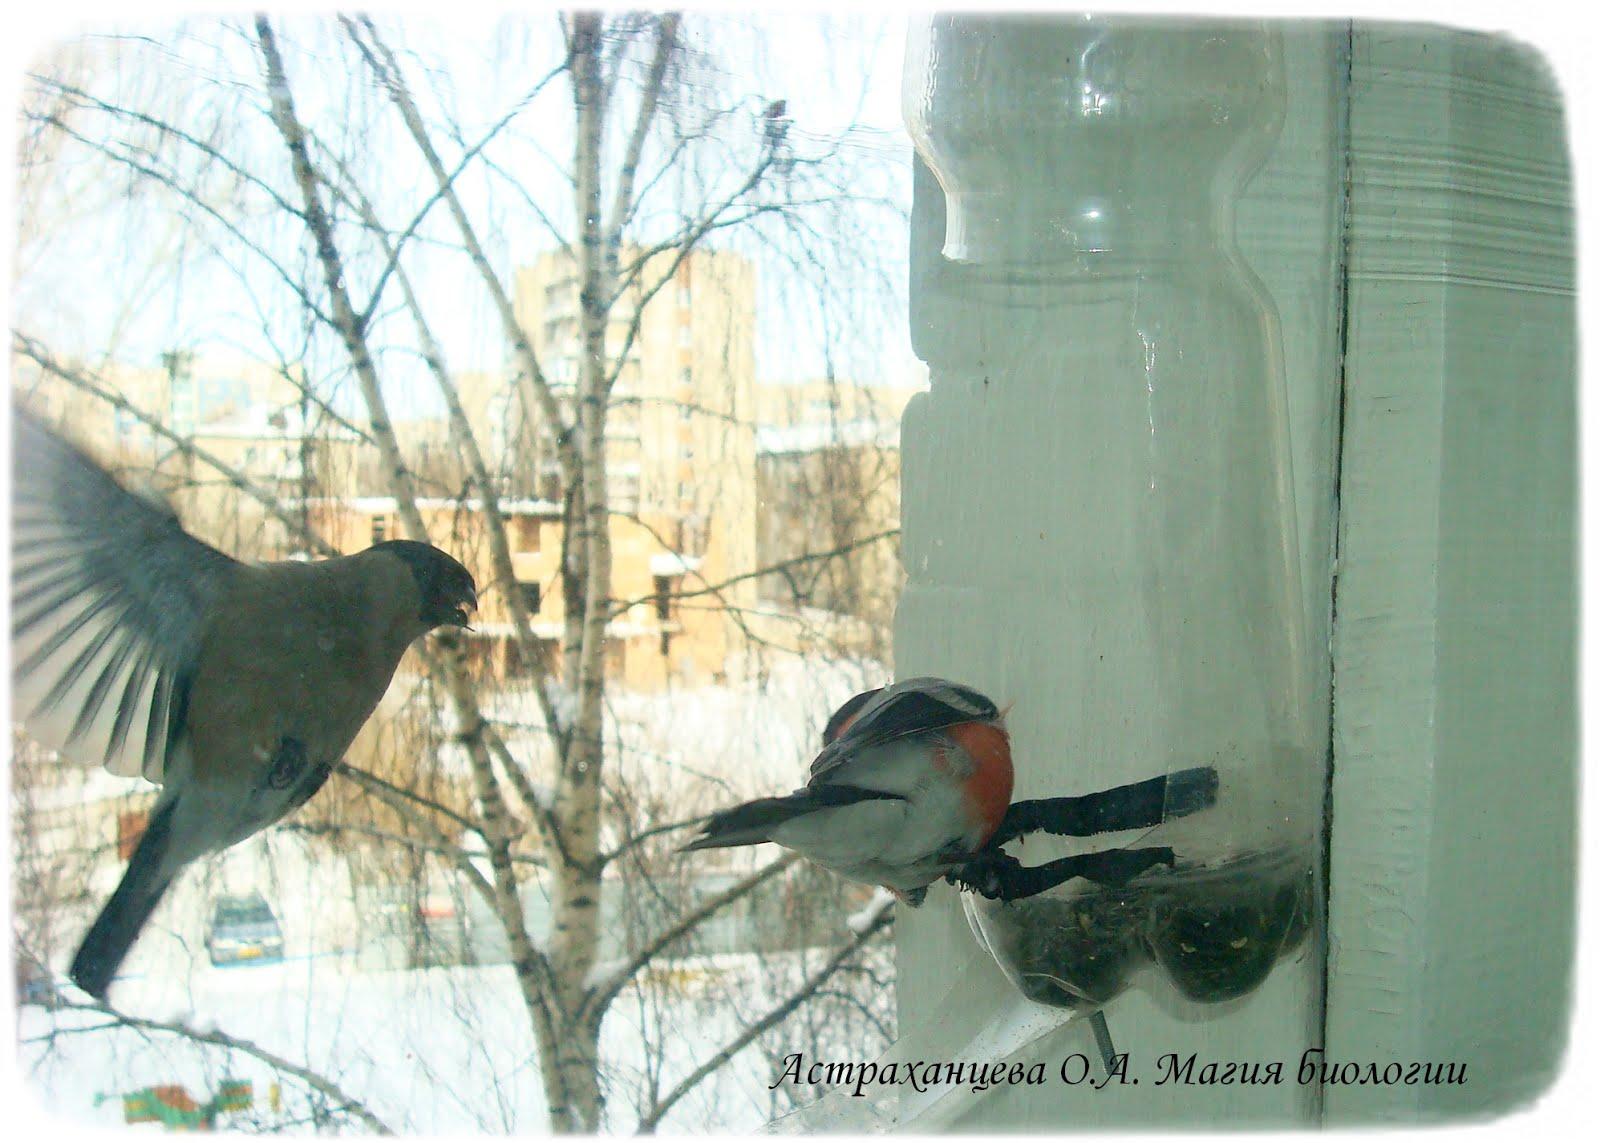 Кормушка птиц за окно своими руками фото 929